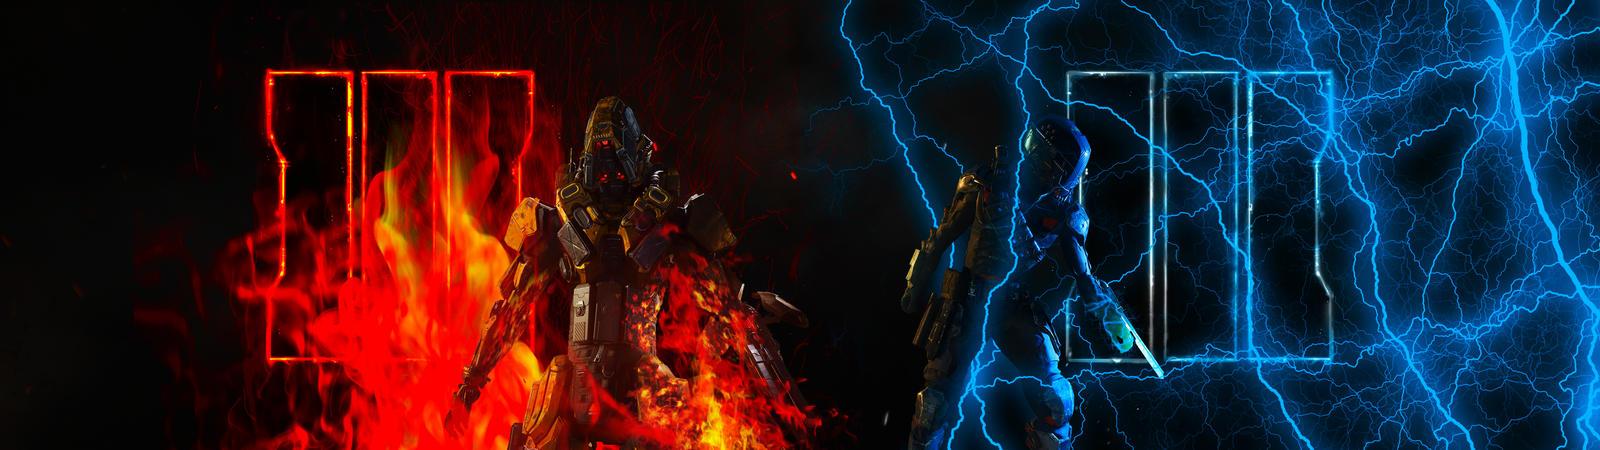 Call Of Duty Black Ops 3 Wallpaper By Mariusmoldrup On Deviantart